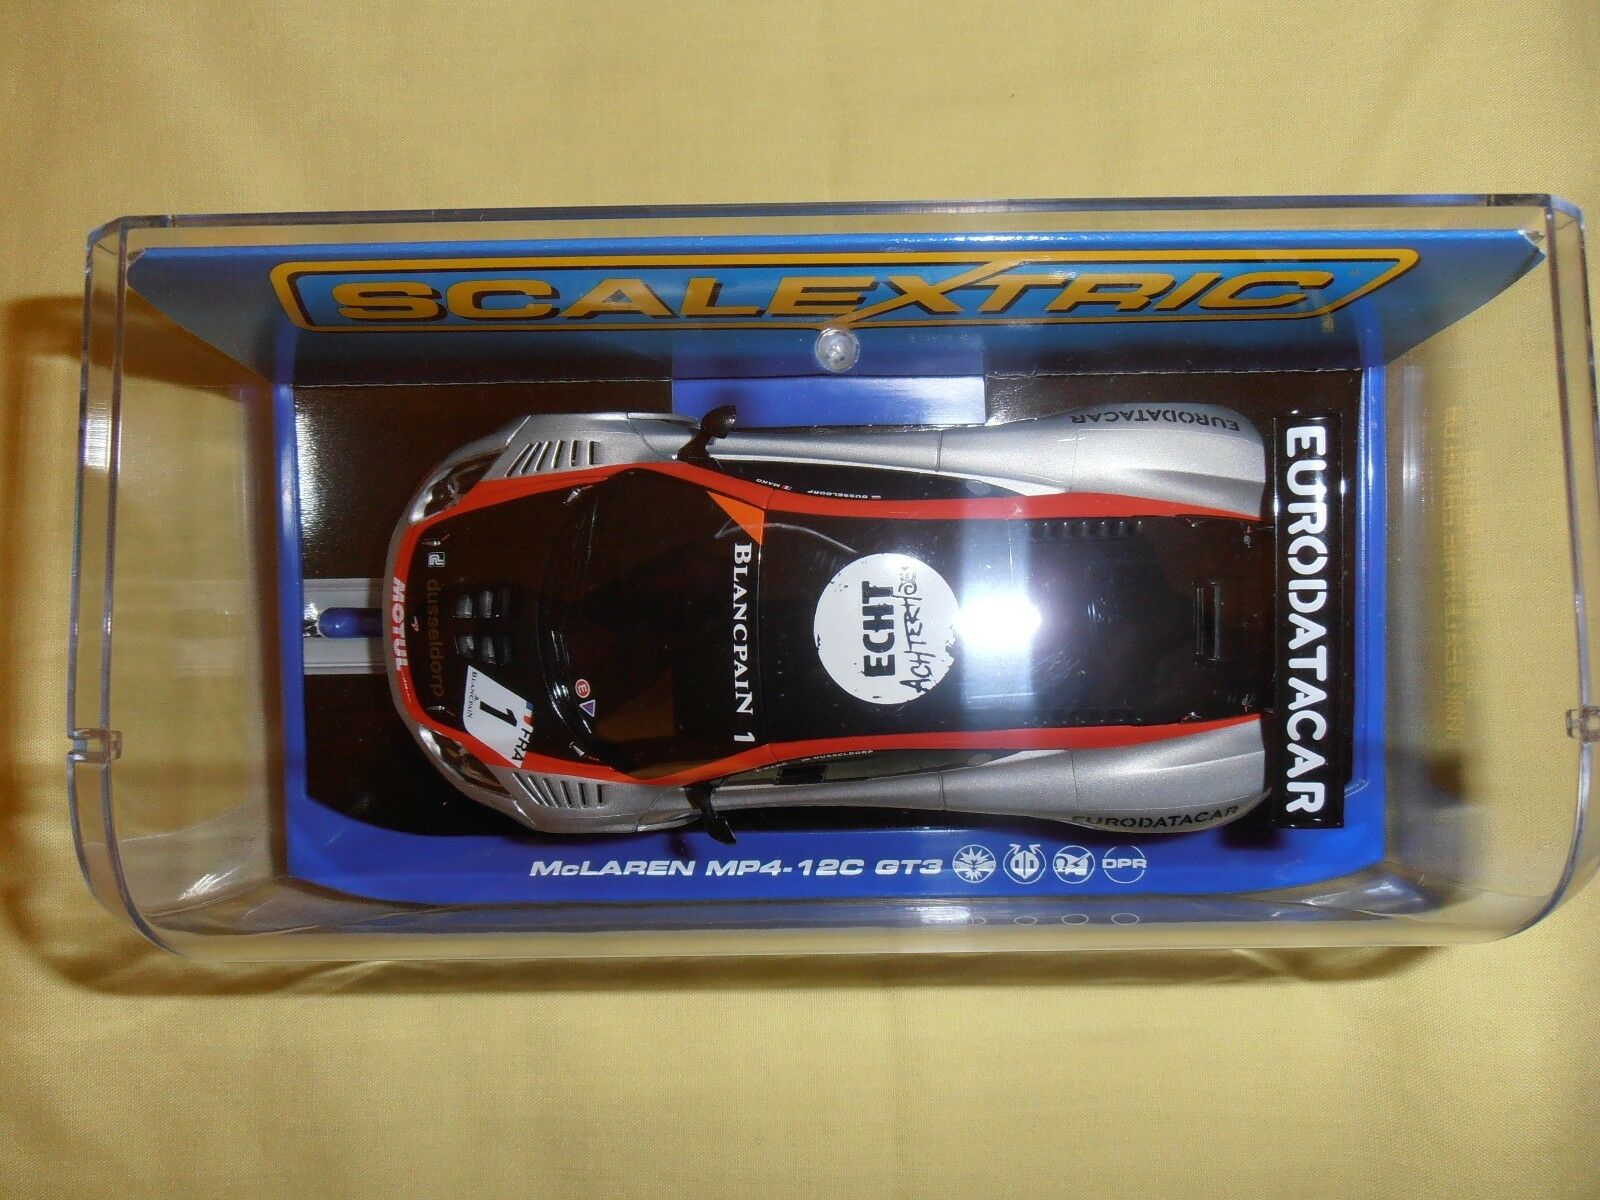 SCALEXTRIC C3382 McLaren MP4-12C GT3 GT3 GT3 no.1 équipe HEXIS Nouveau Ninco SCX Pioneer 87efd4